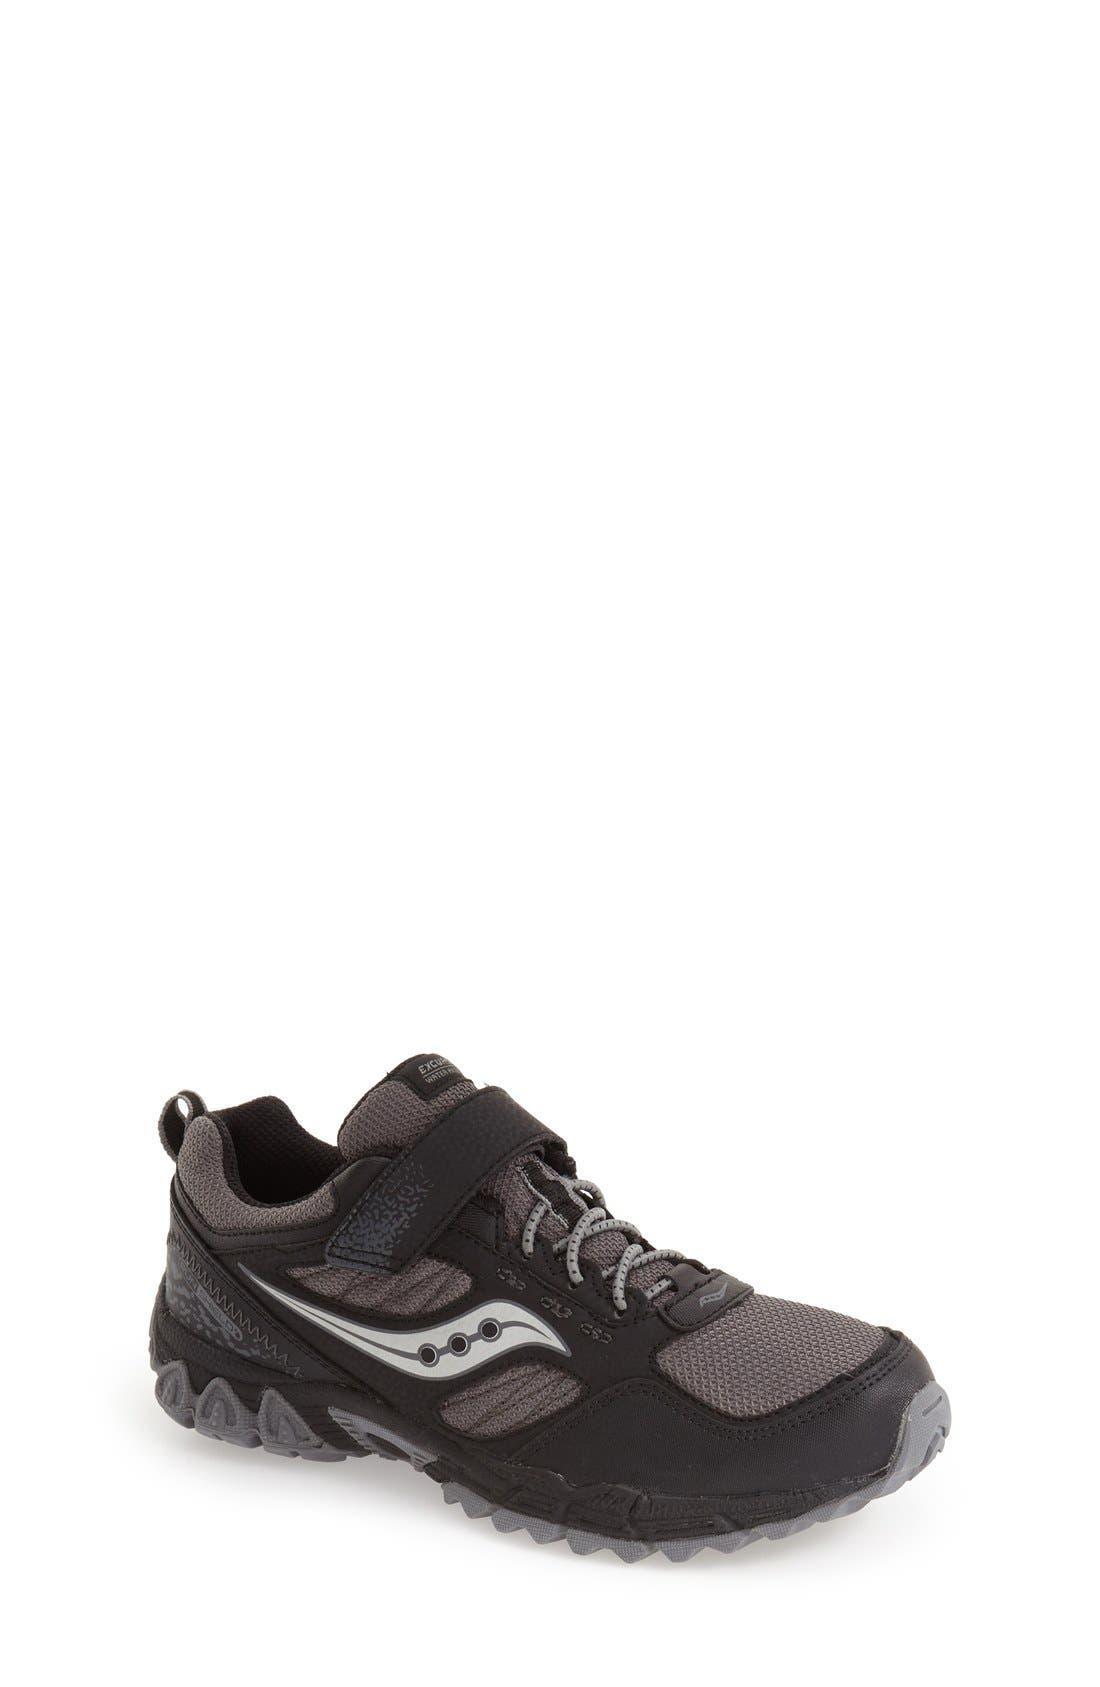 'Excursion Shield' Water Resistant Trail Shoe,                         Main,                         color, 001